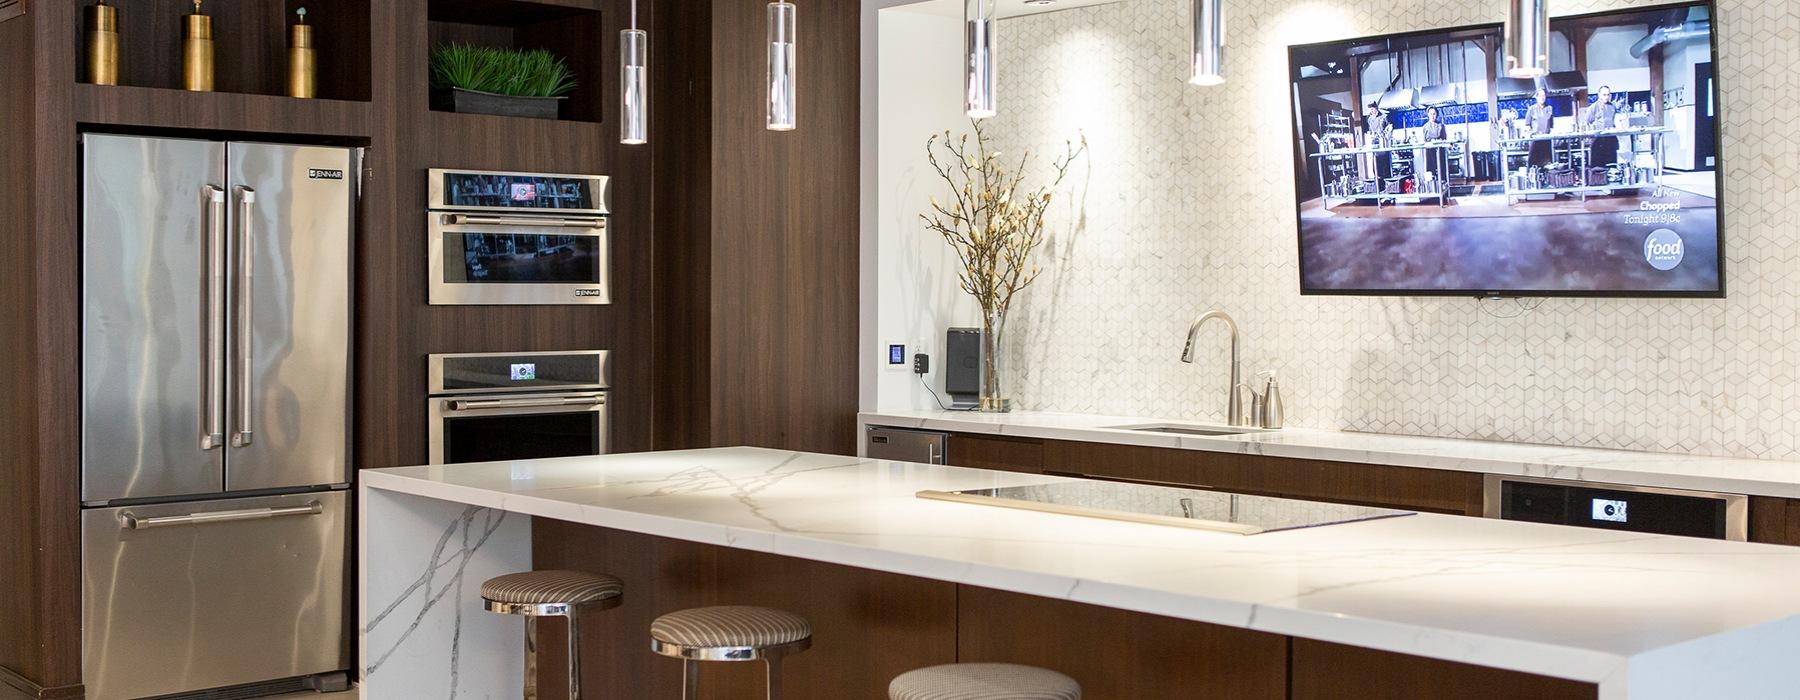 resident kitchen area